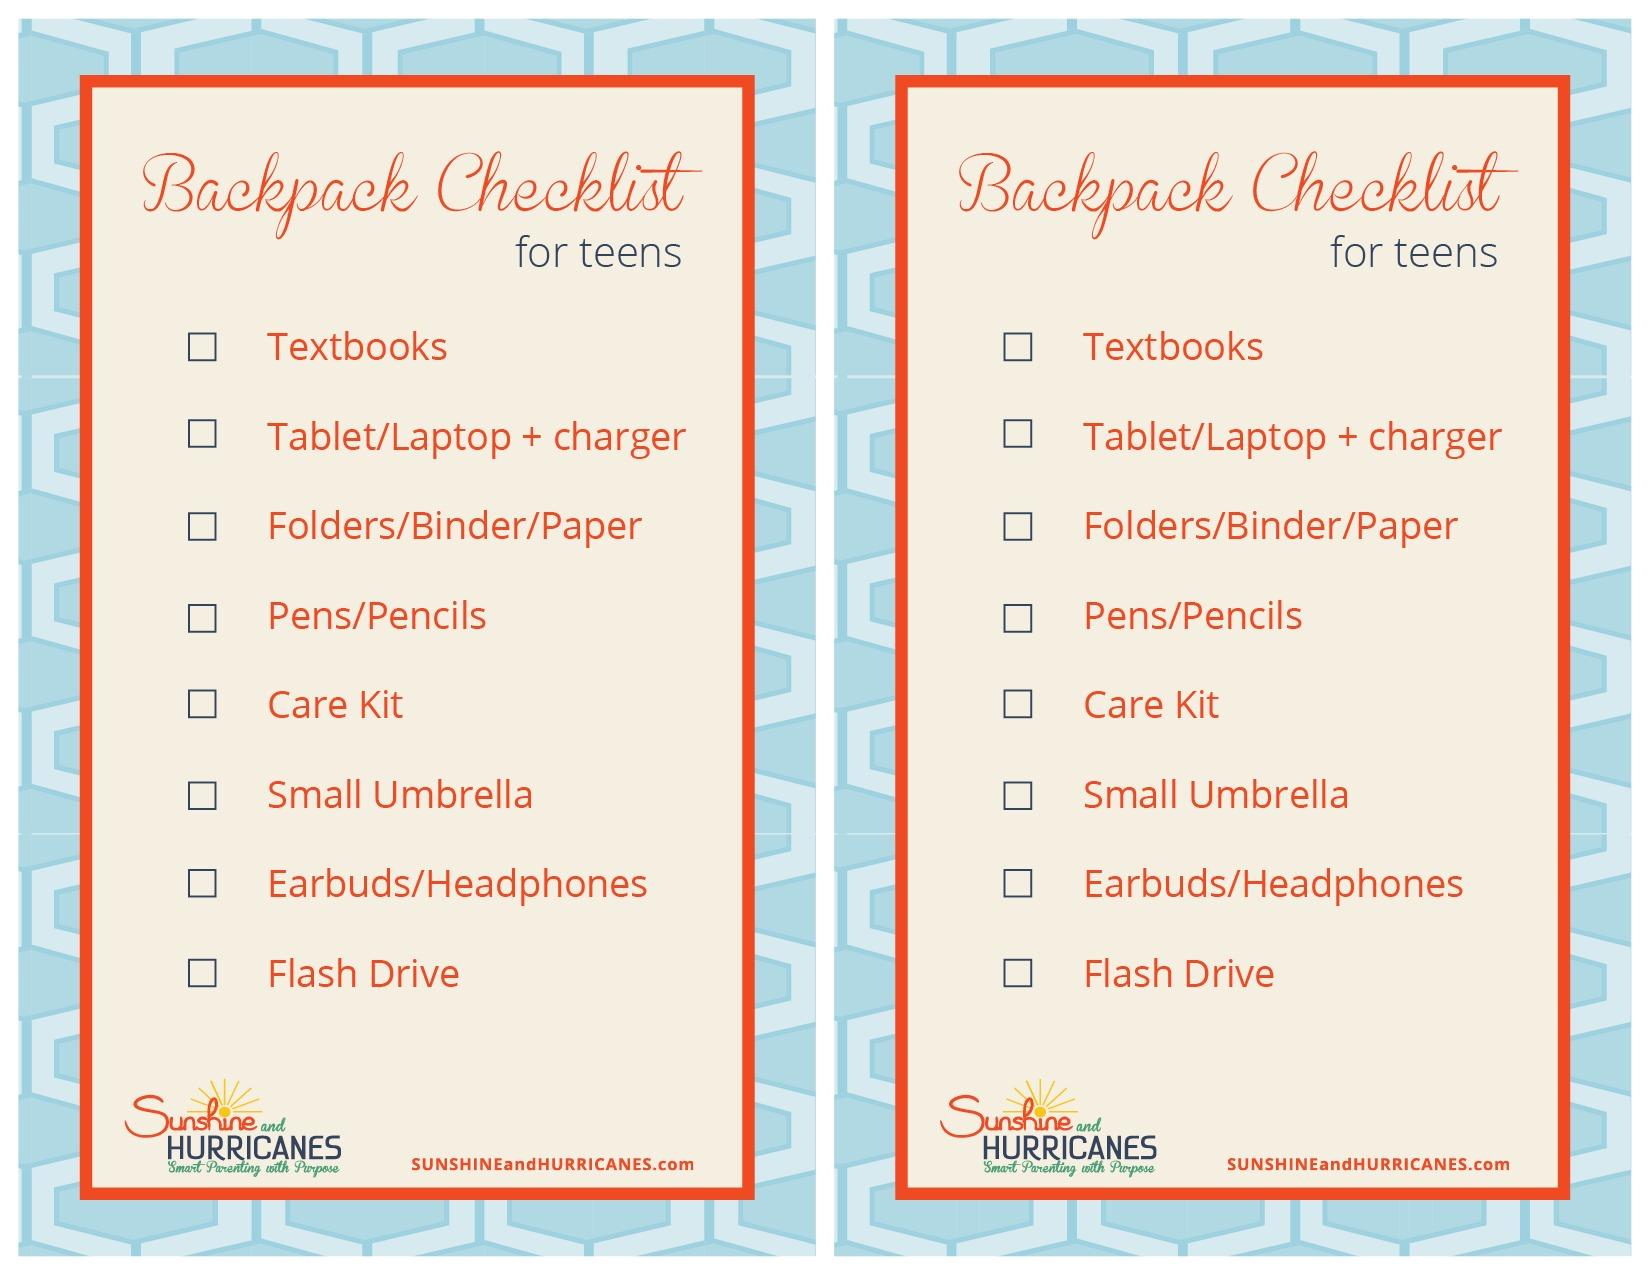 Teen Organization Backpack Checklist